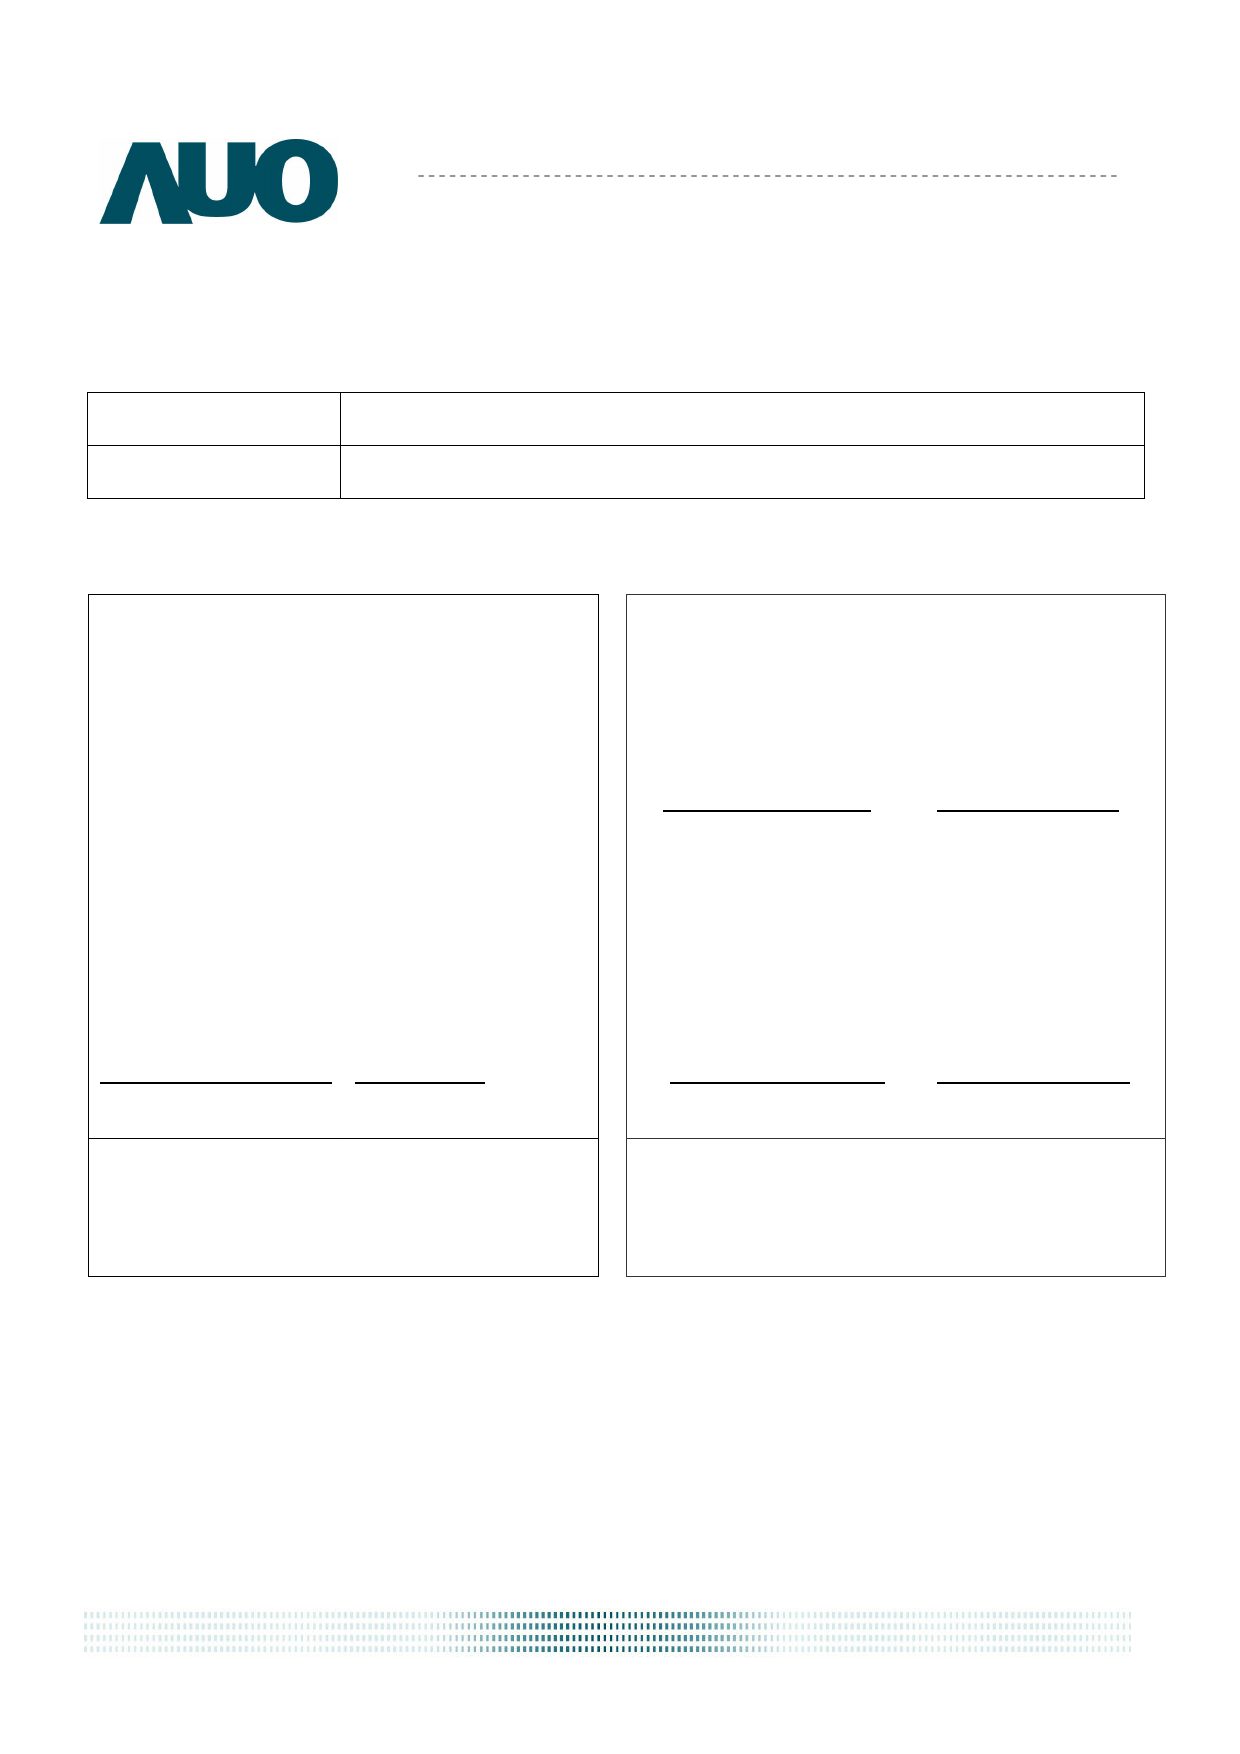 G070VTN01.0 دیتاشیت PDF